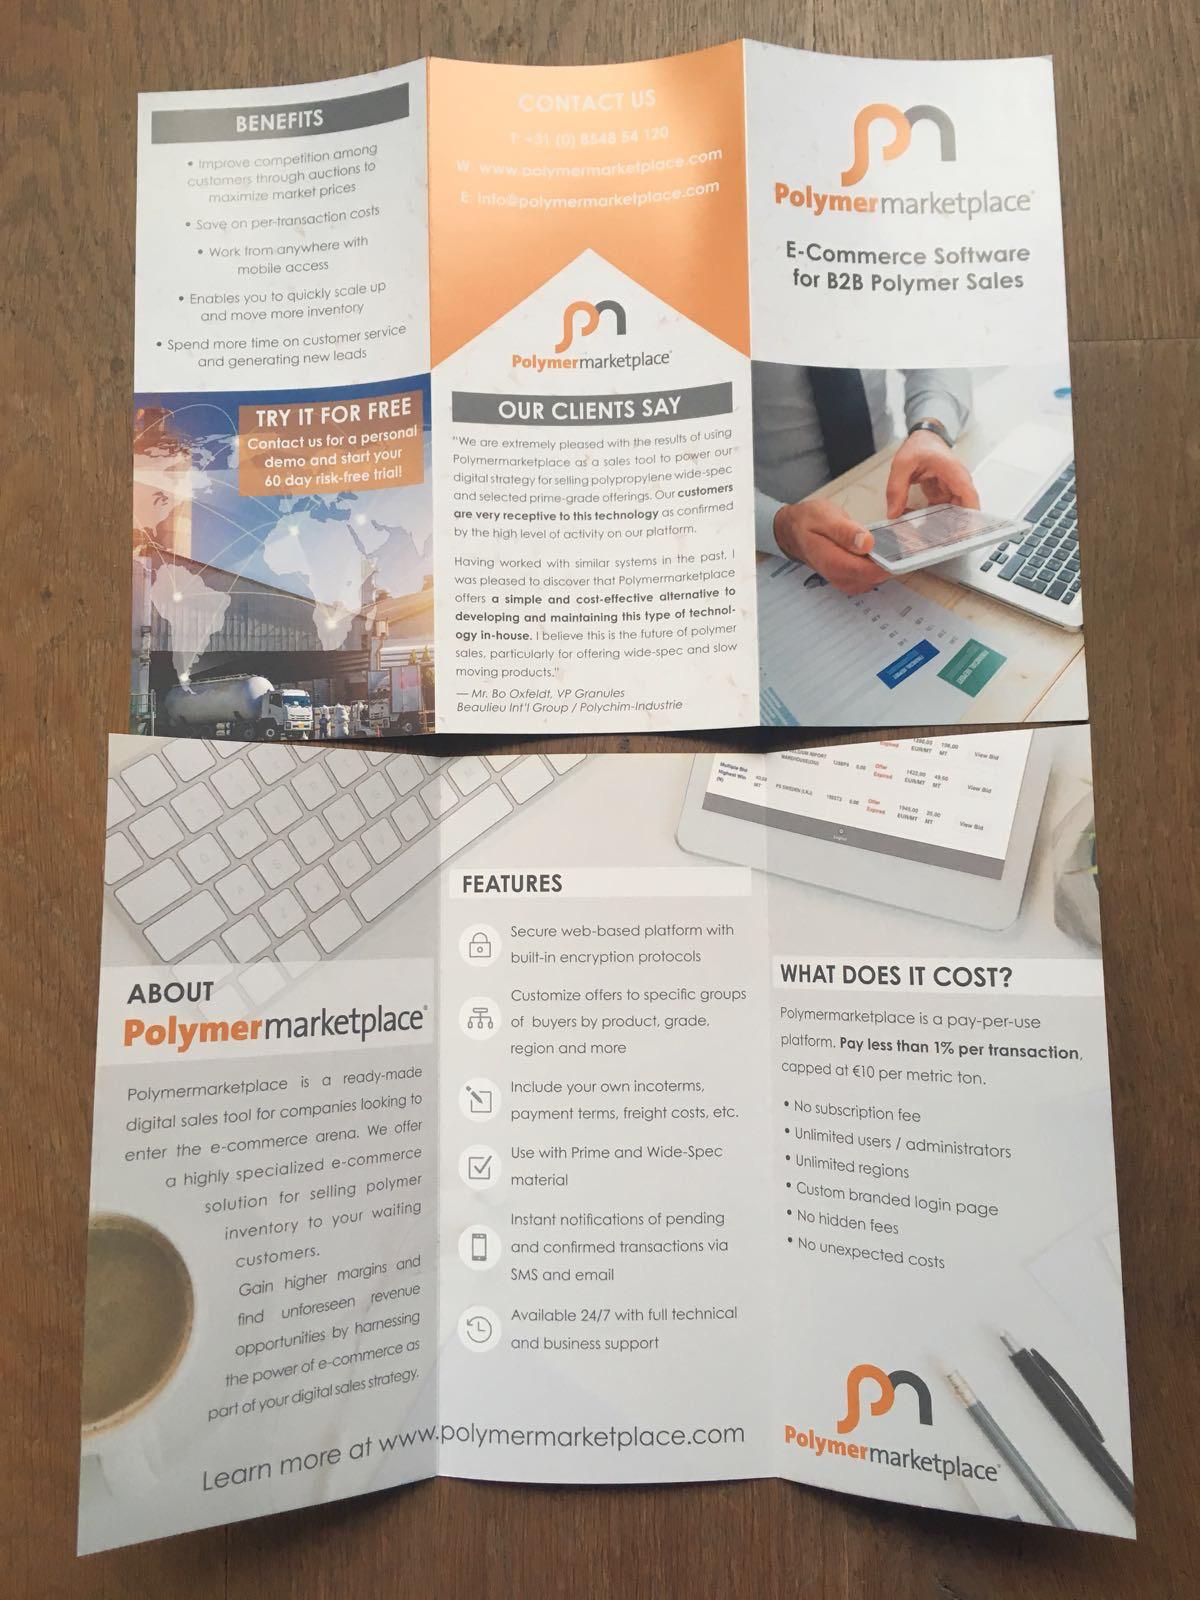 Polymermarketplace brochure